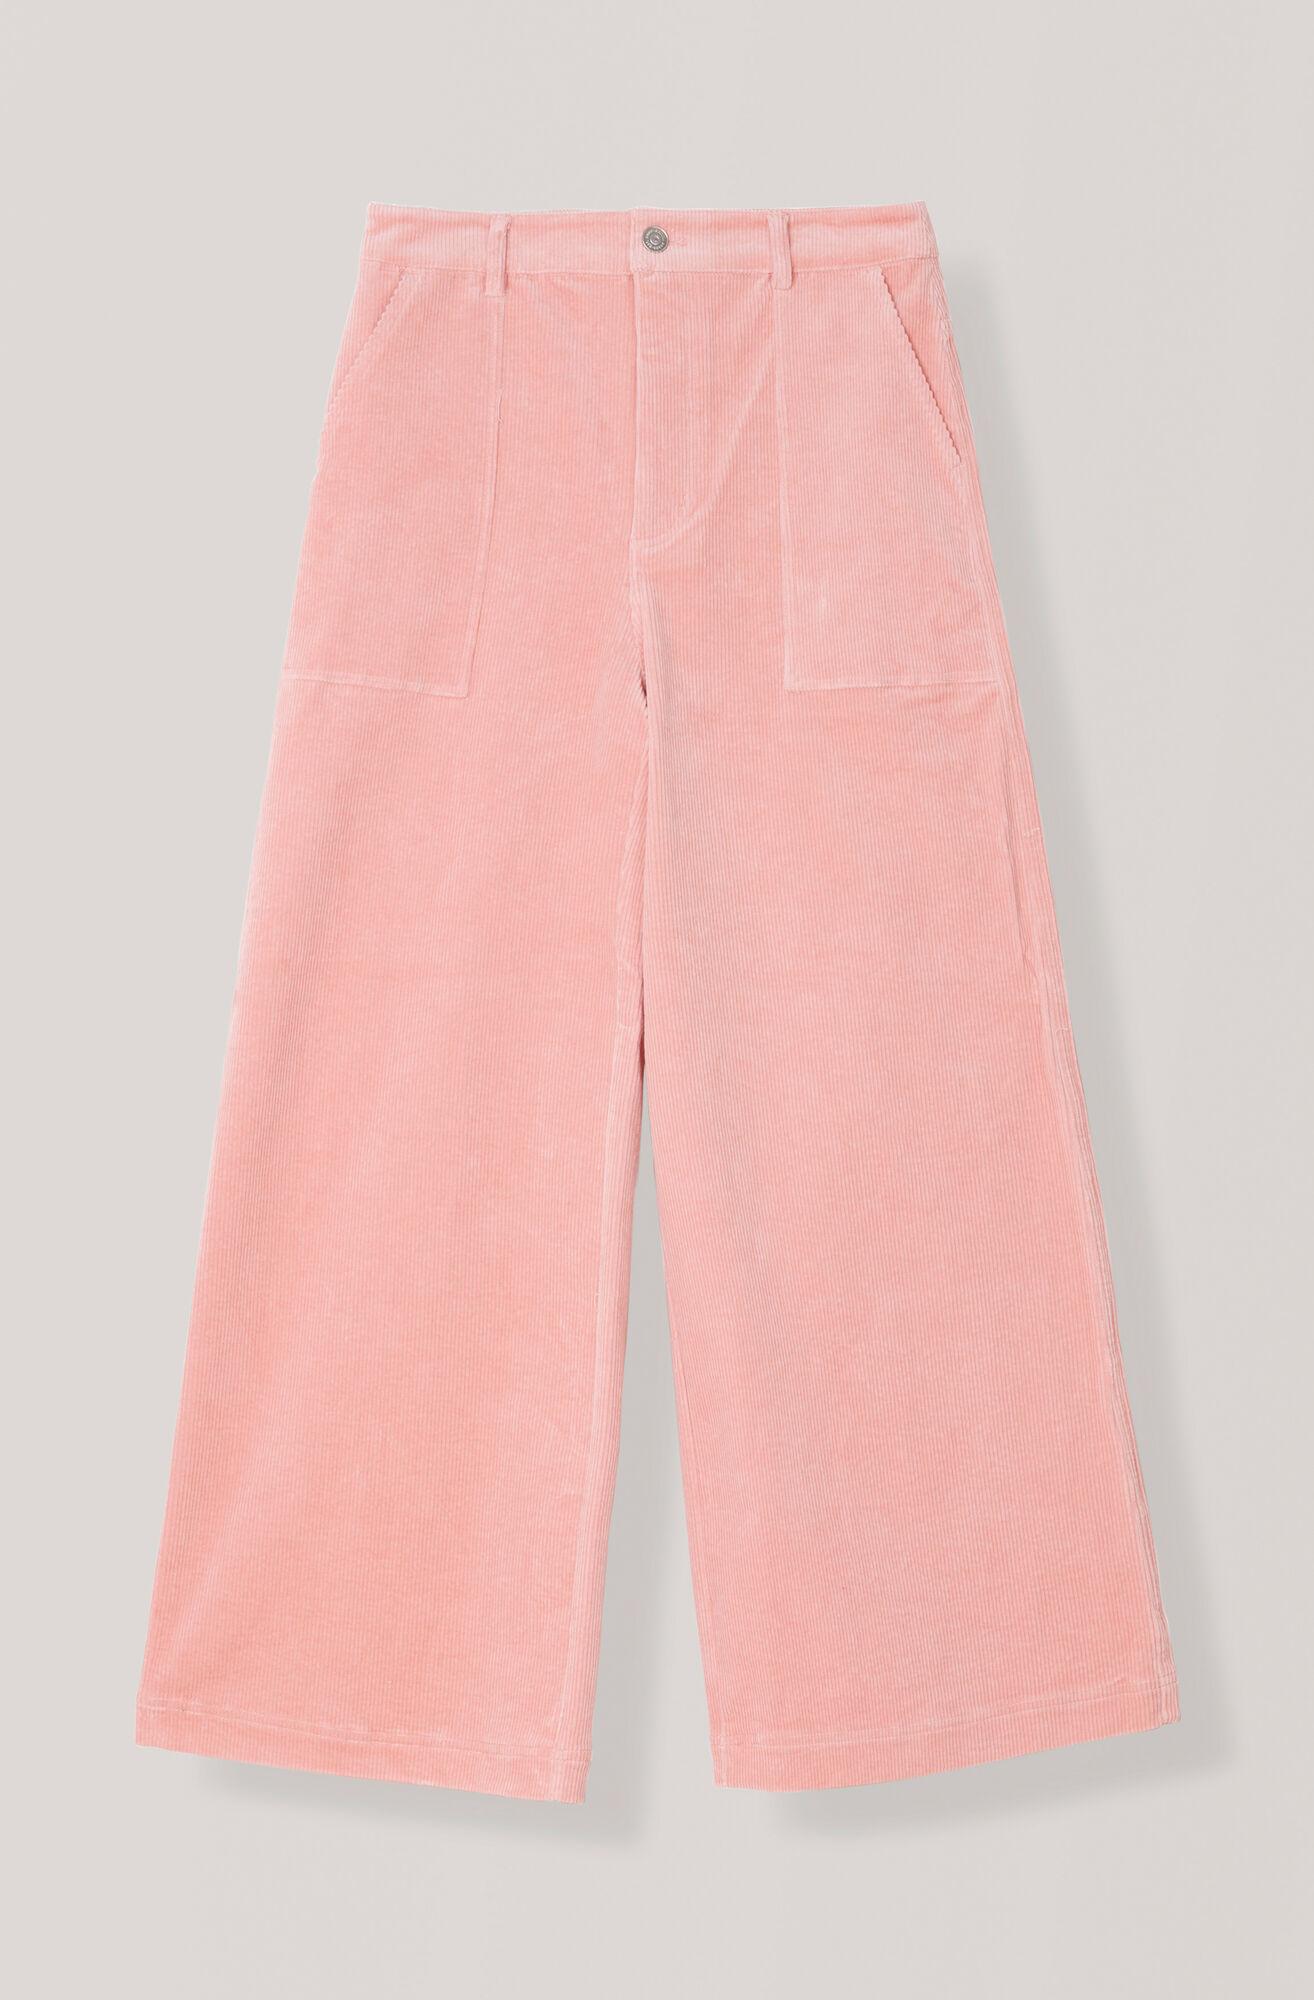 Stretch Corduroy Weite Hose, Silver Pink, hi-res